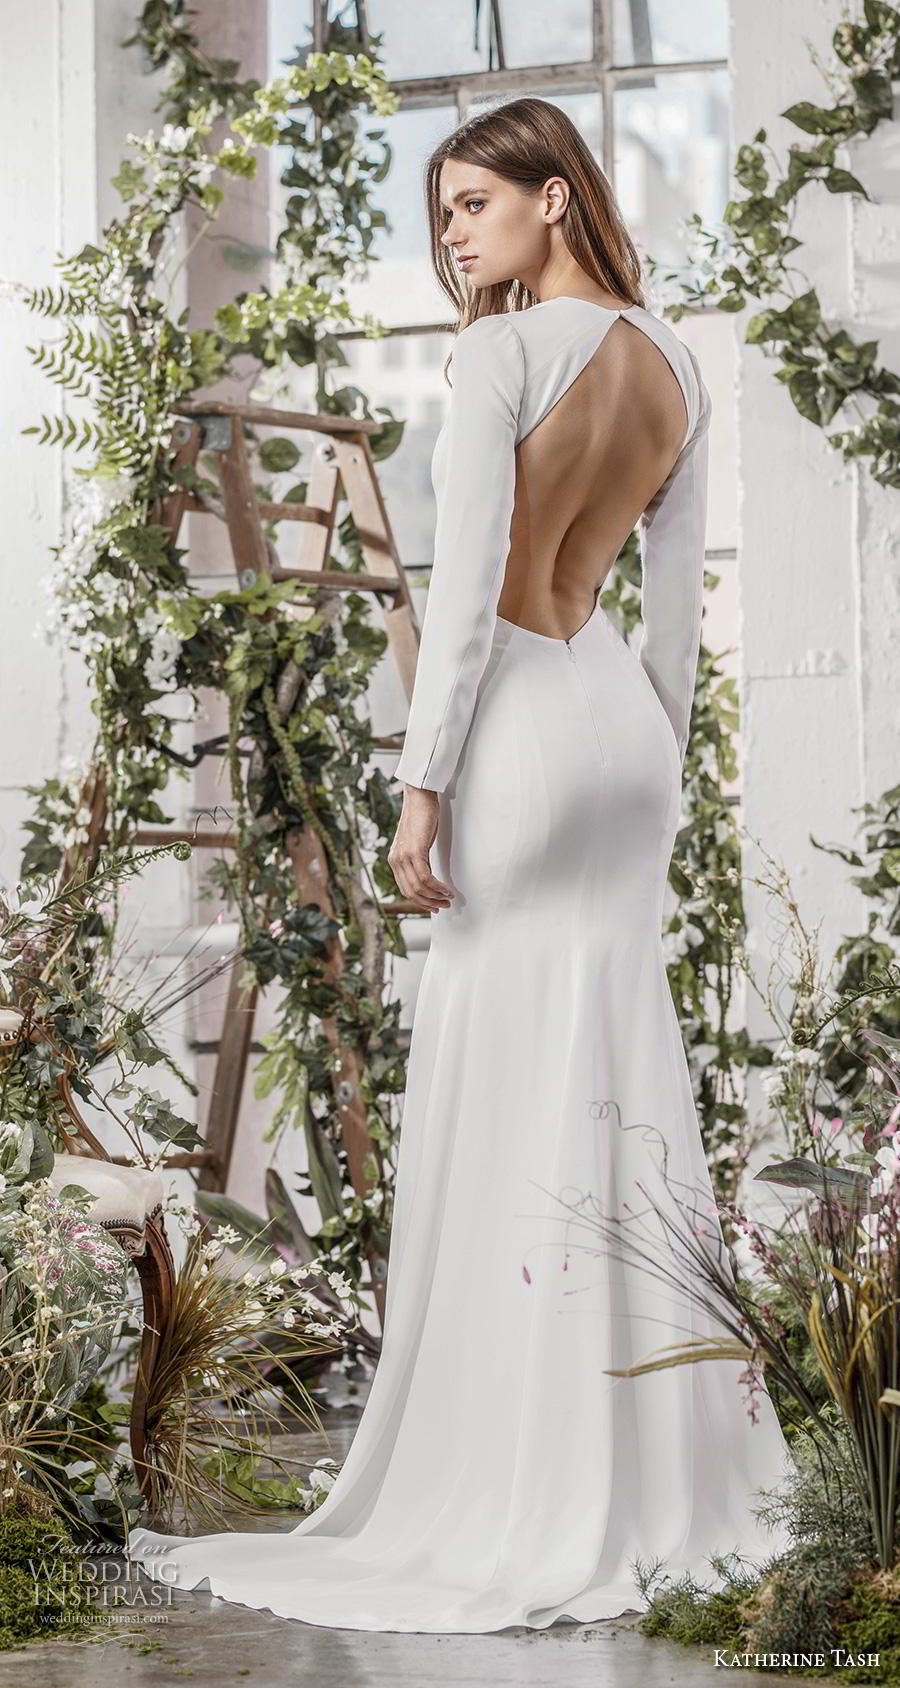 katherine tash fall 2019 bridal long sleeves deep plunging v neck simple clean minimalist elegant sheath wedding dress low keyhole back sweep train (4) bv